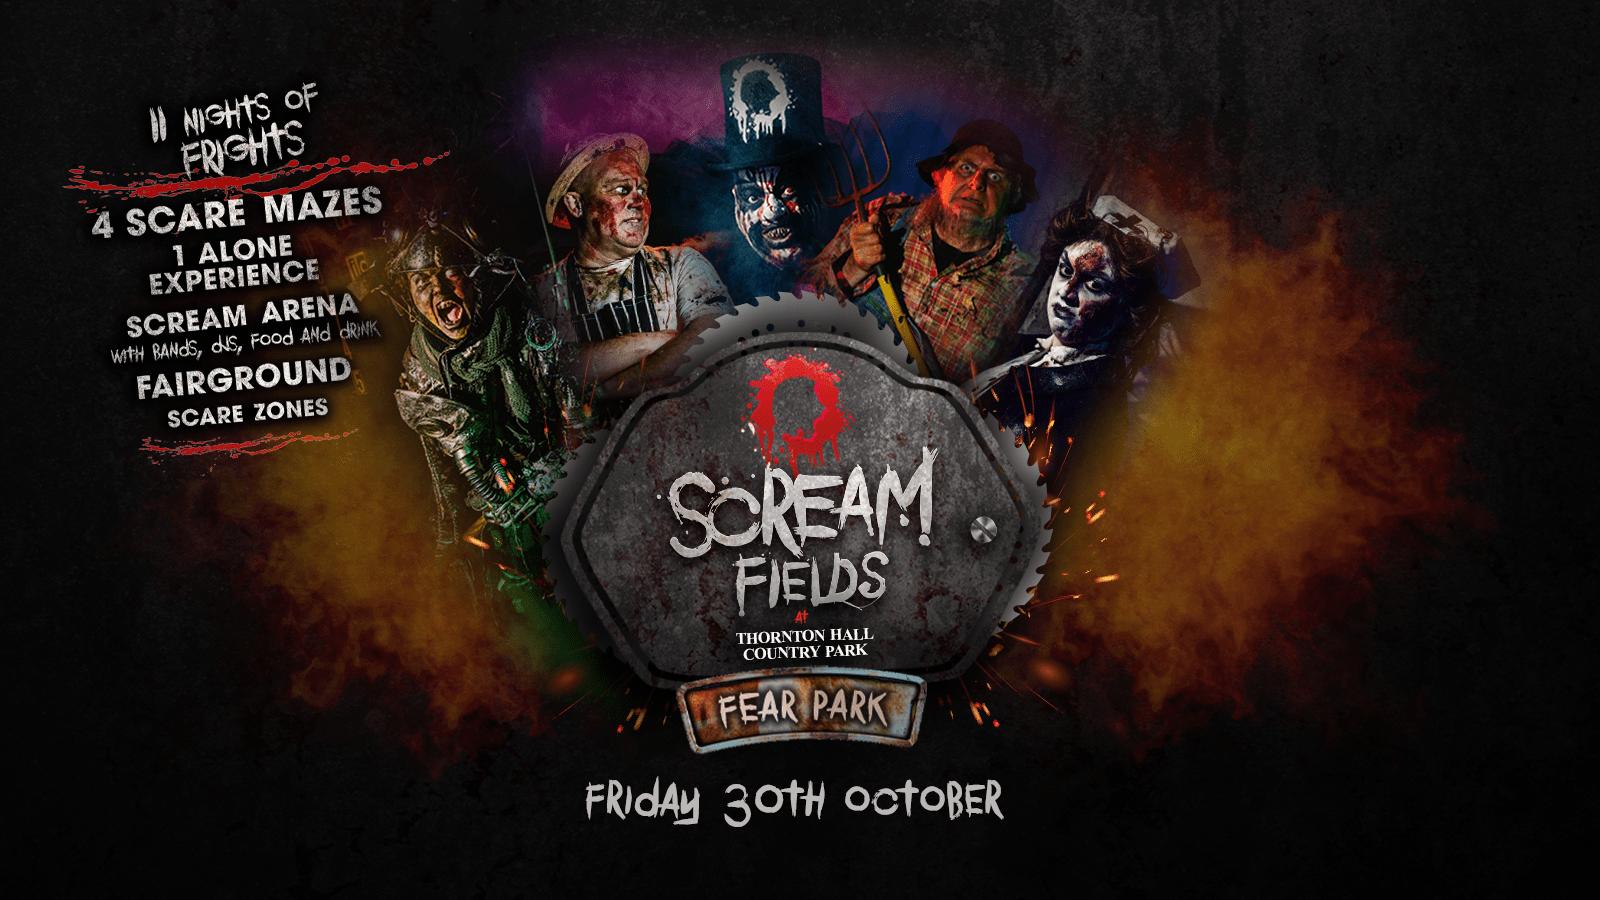 7.30PM – Screamfields: Friday 30th October 2020